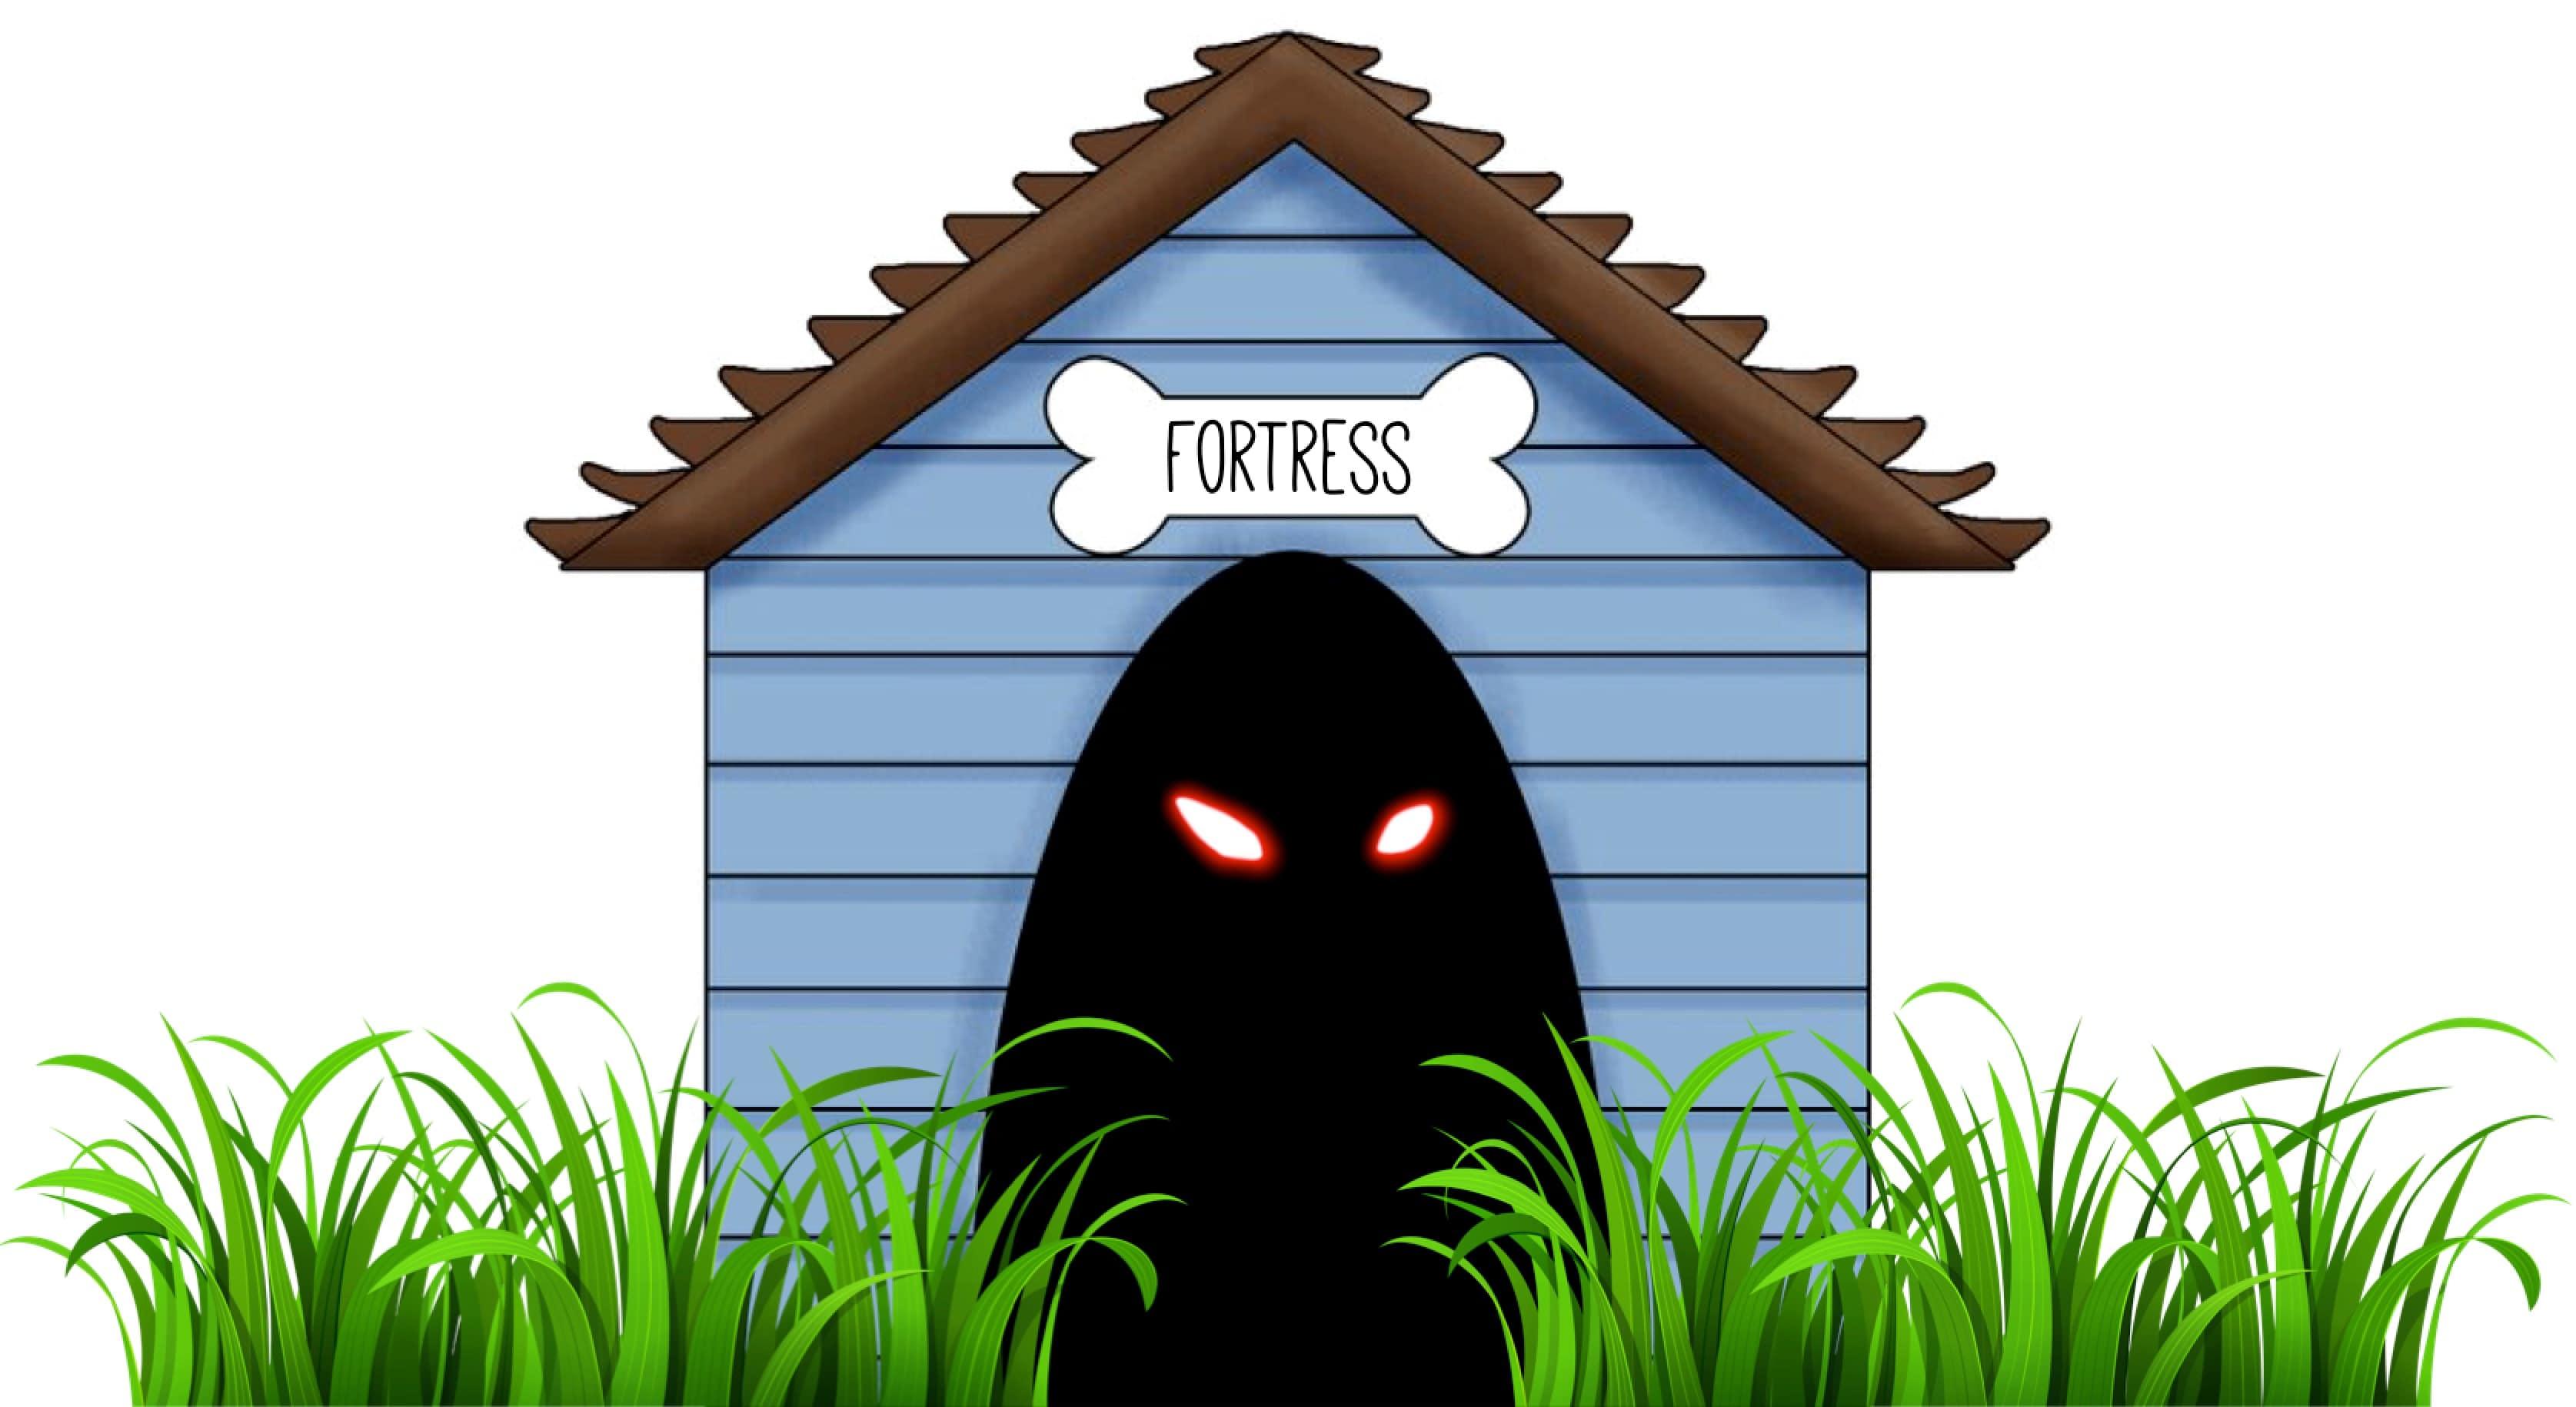 fortress dog house-min